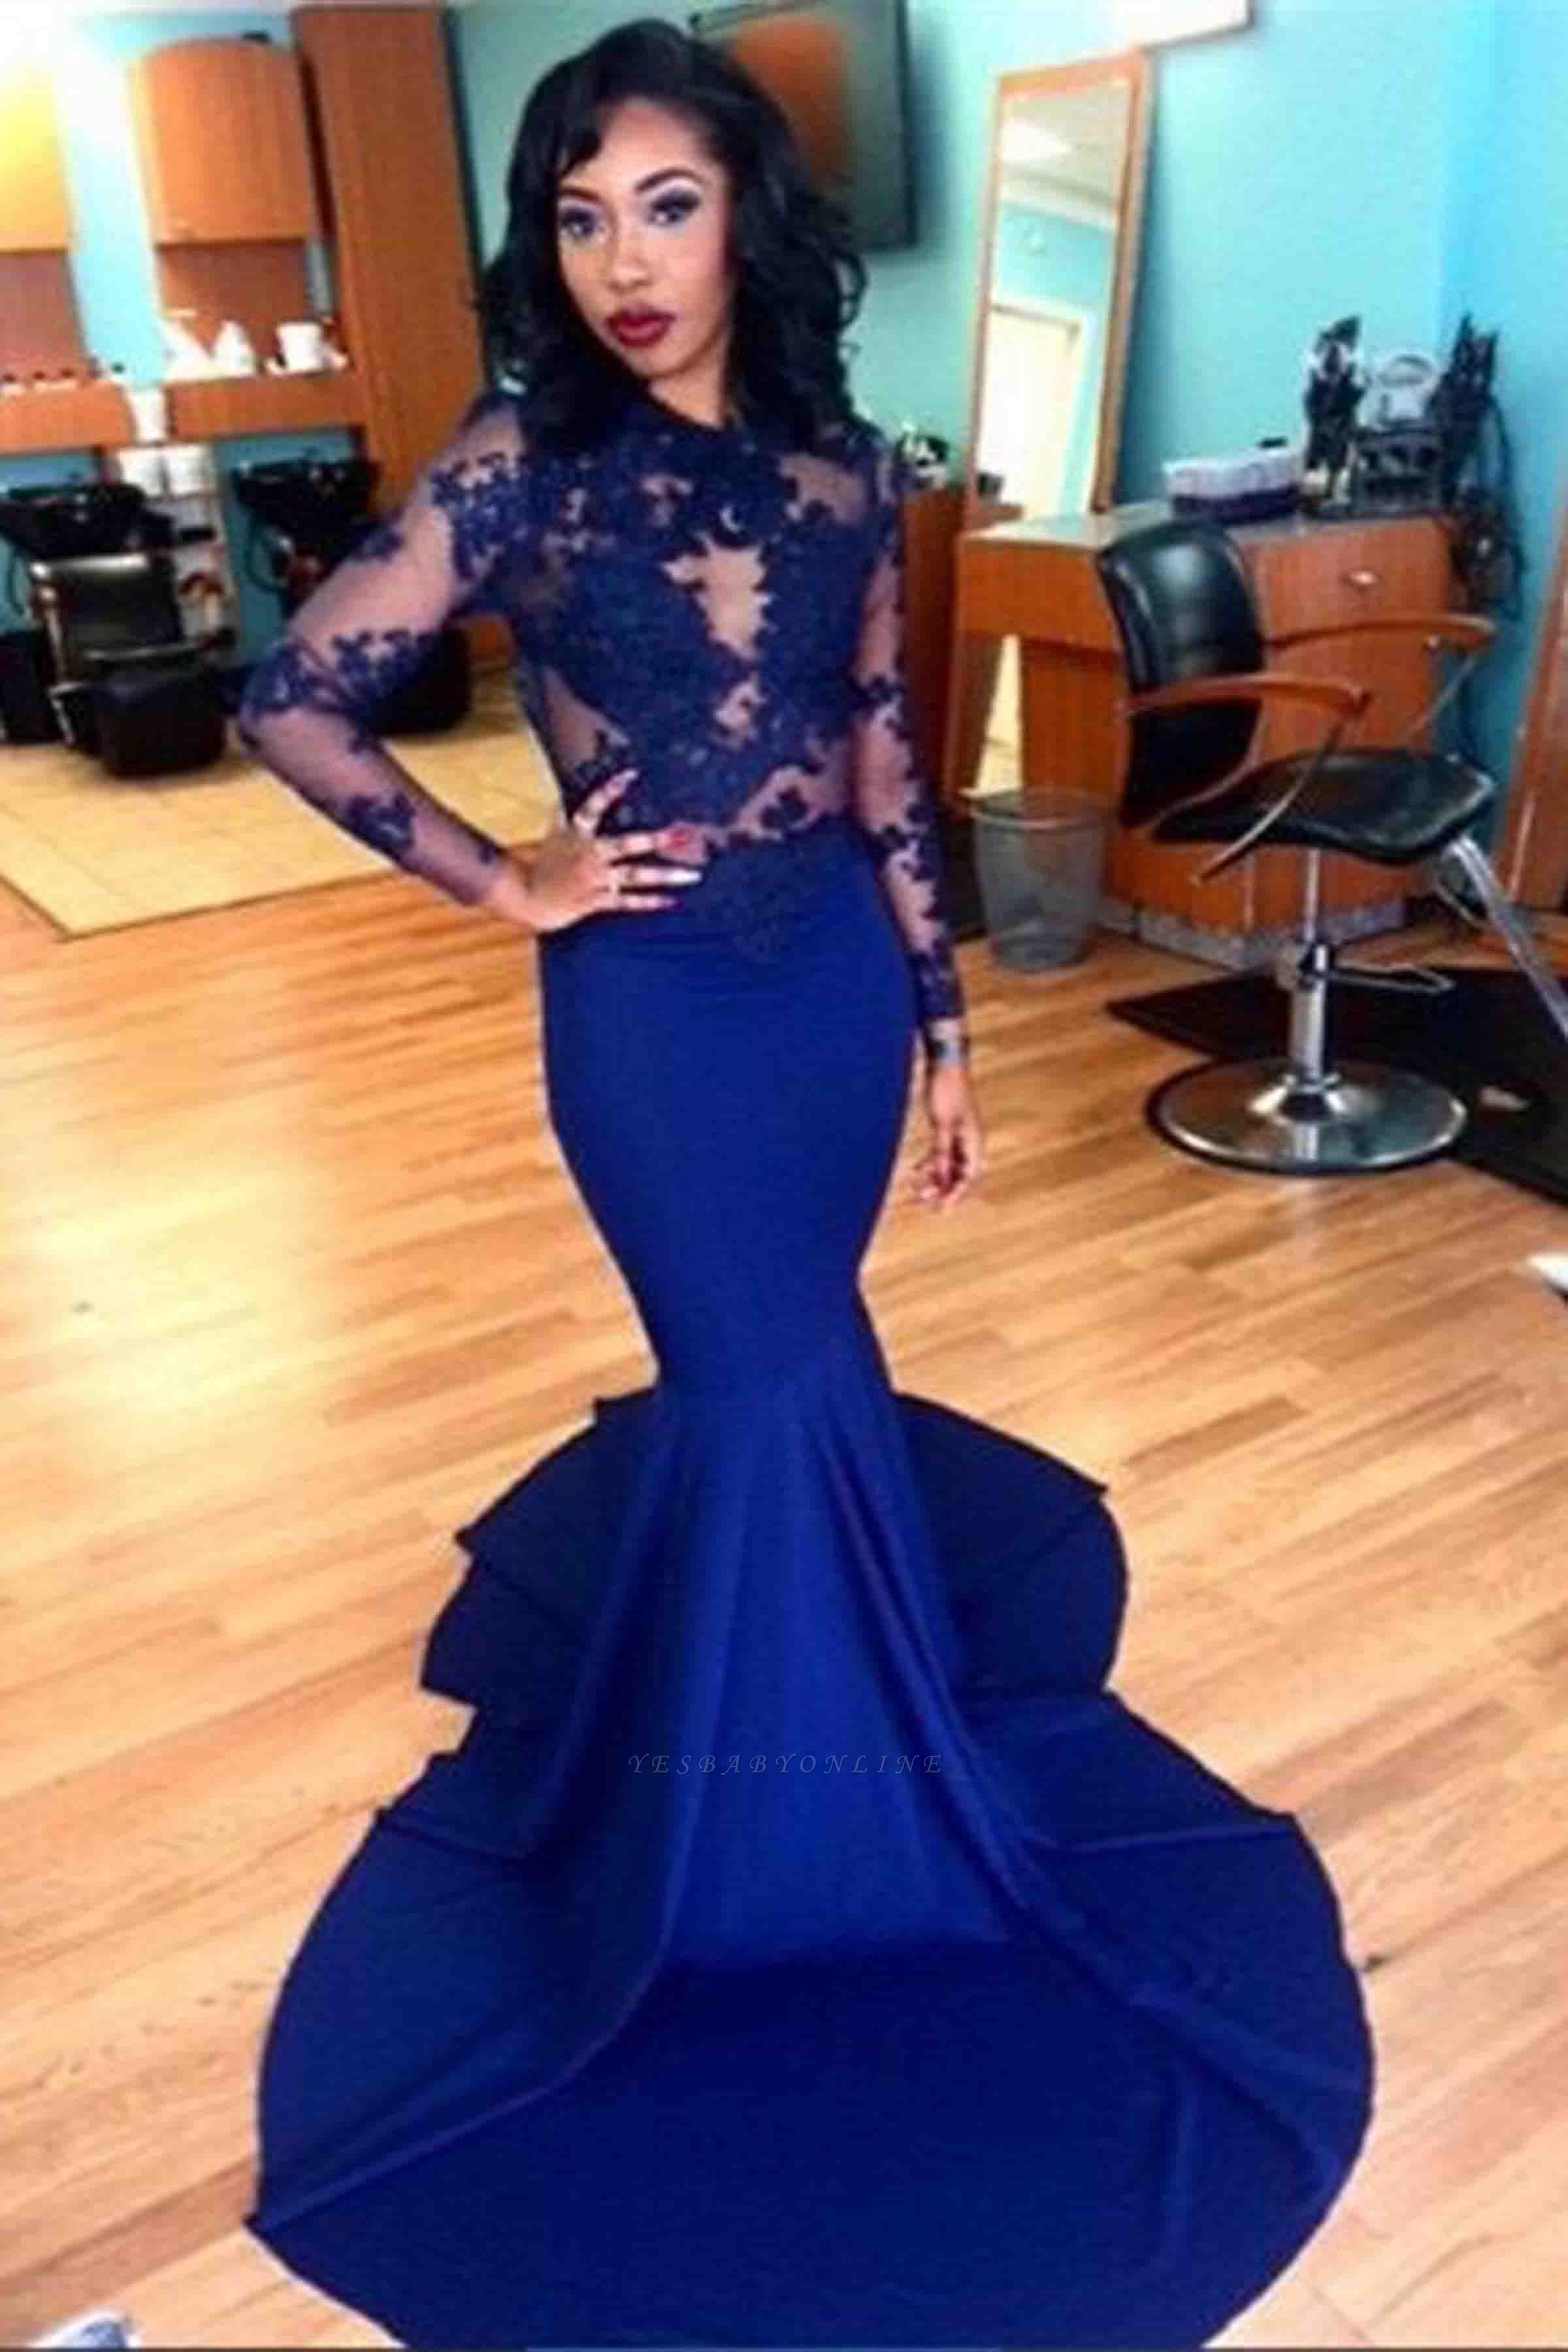 Royal-Blue Long Sheer Lace Long-Sleeves Mermaid Prom Dresses